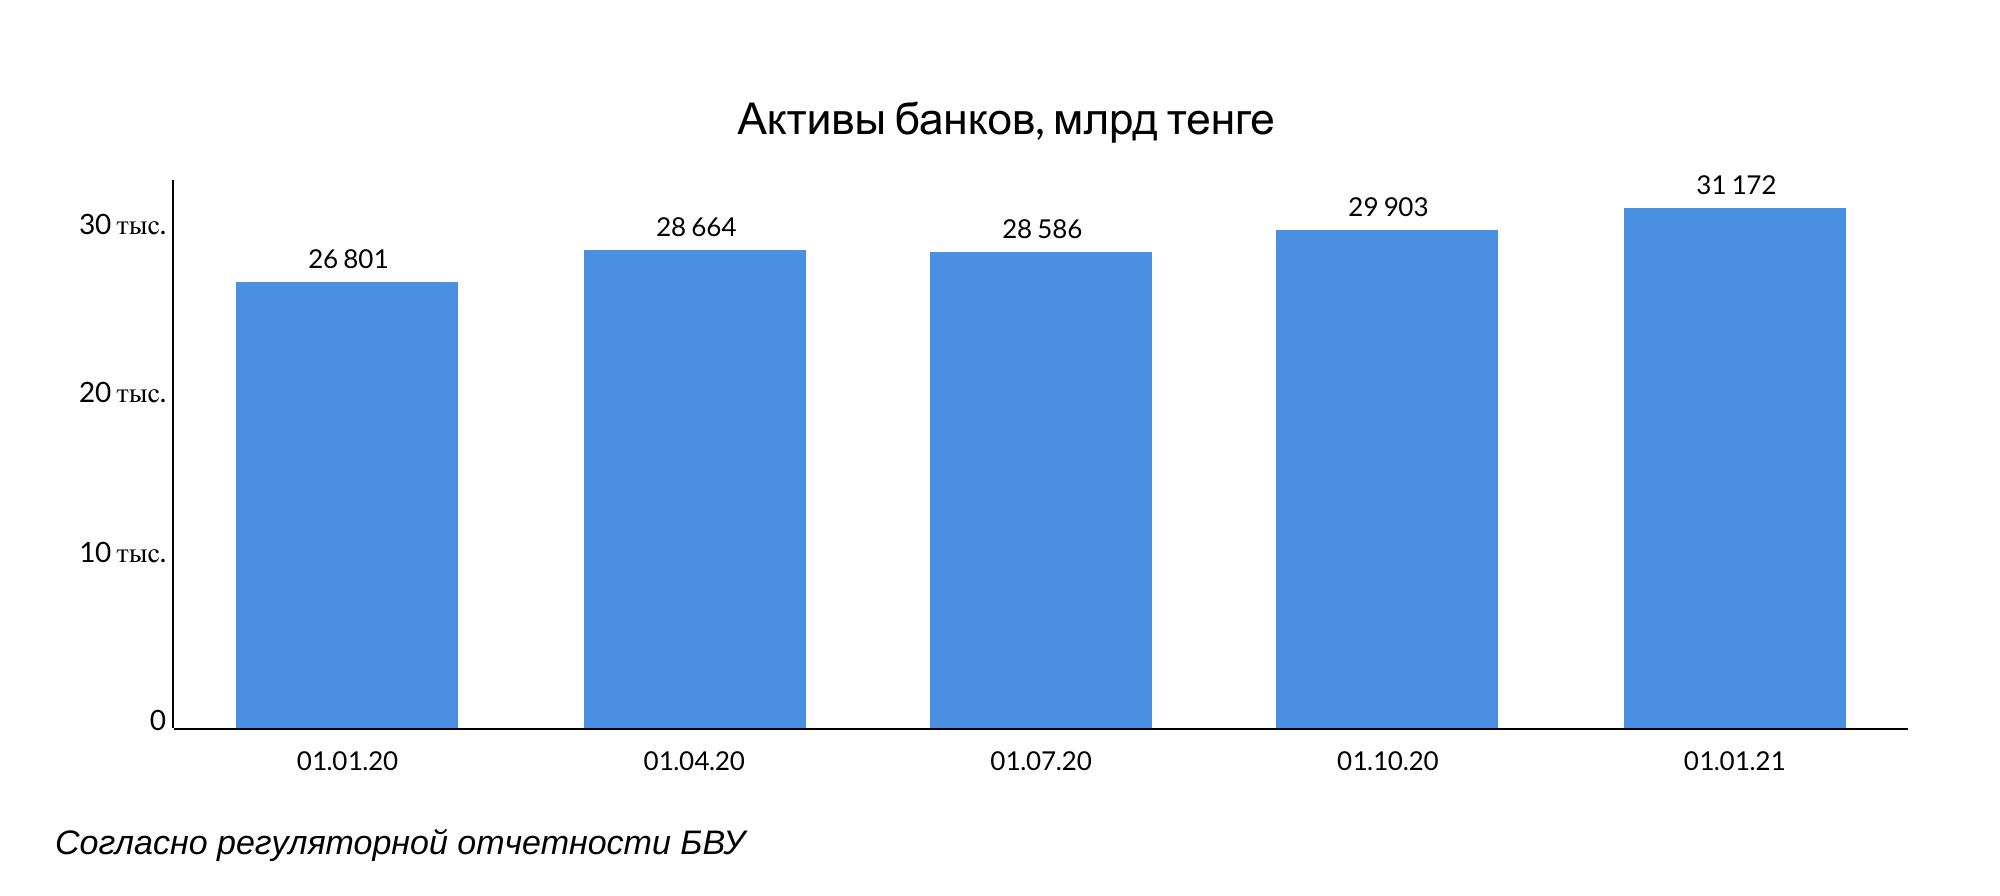 Банки Казахстана продолжают наращивать запасы ликвидности 595645 - Kapital.kz